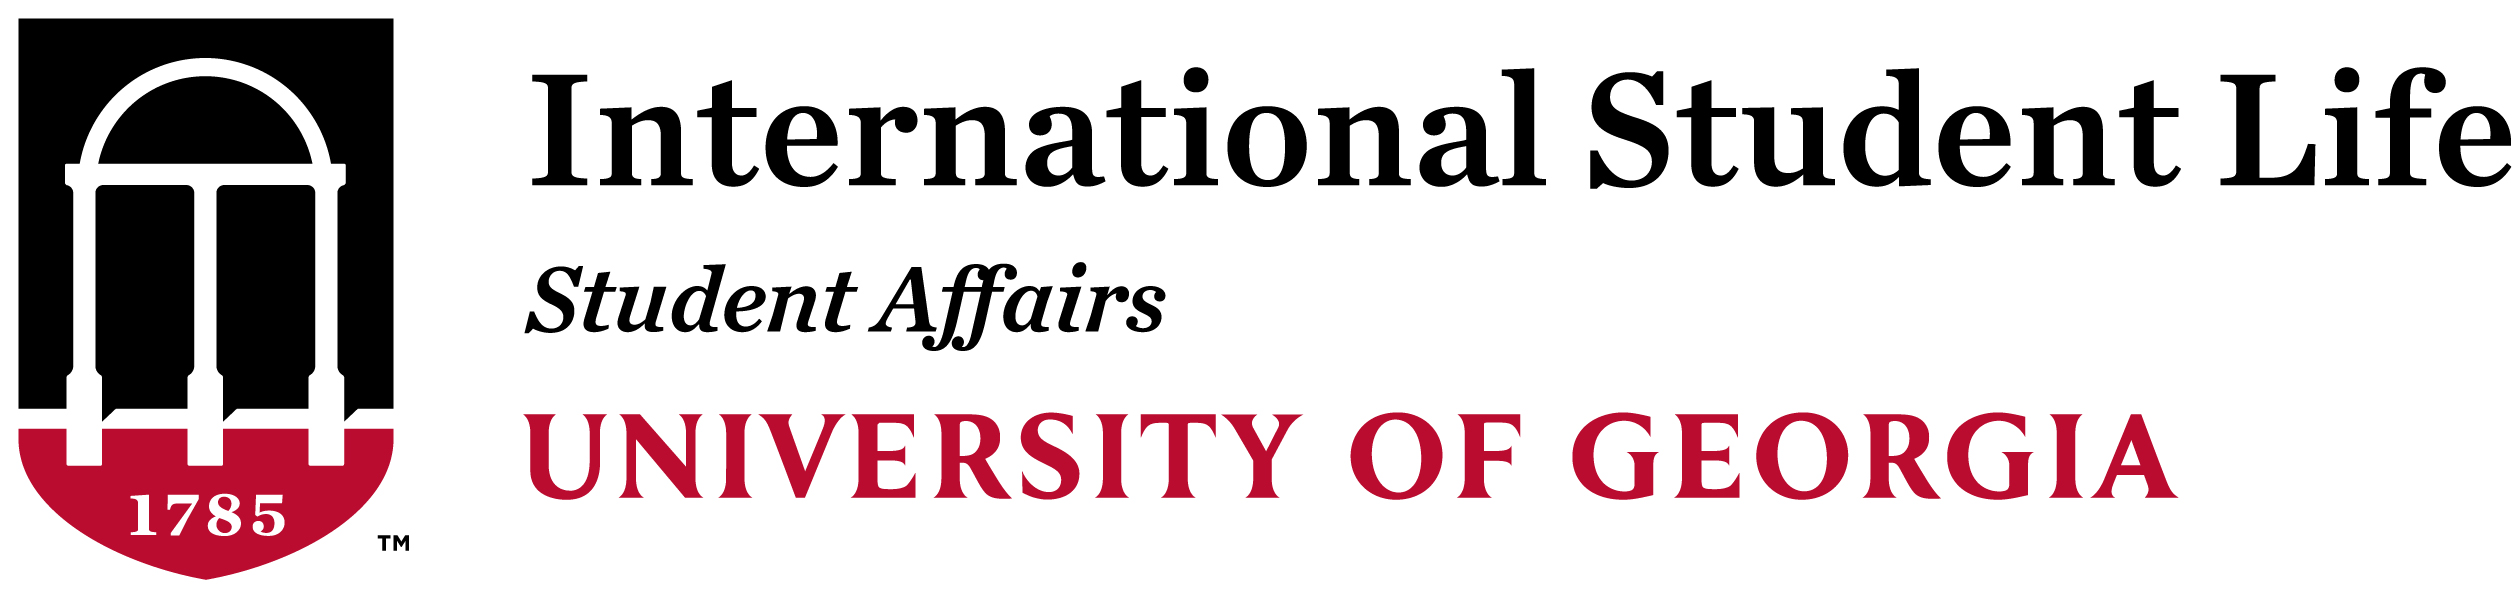 International Student Life